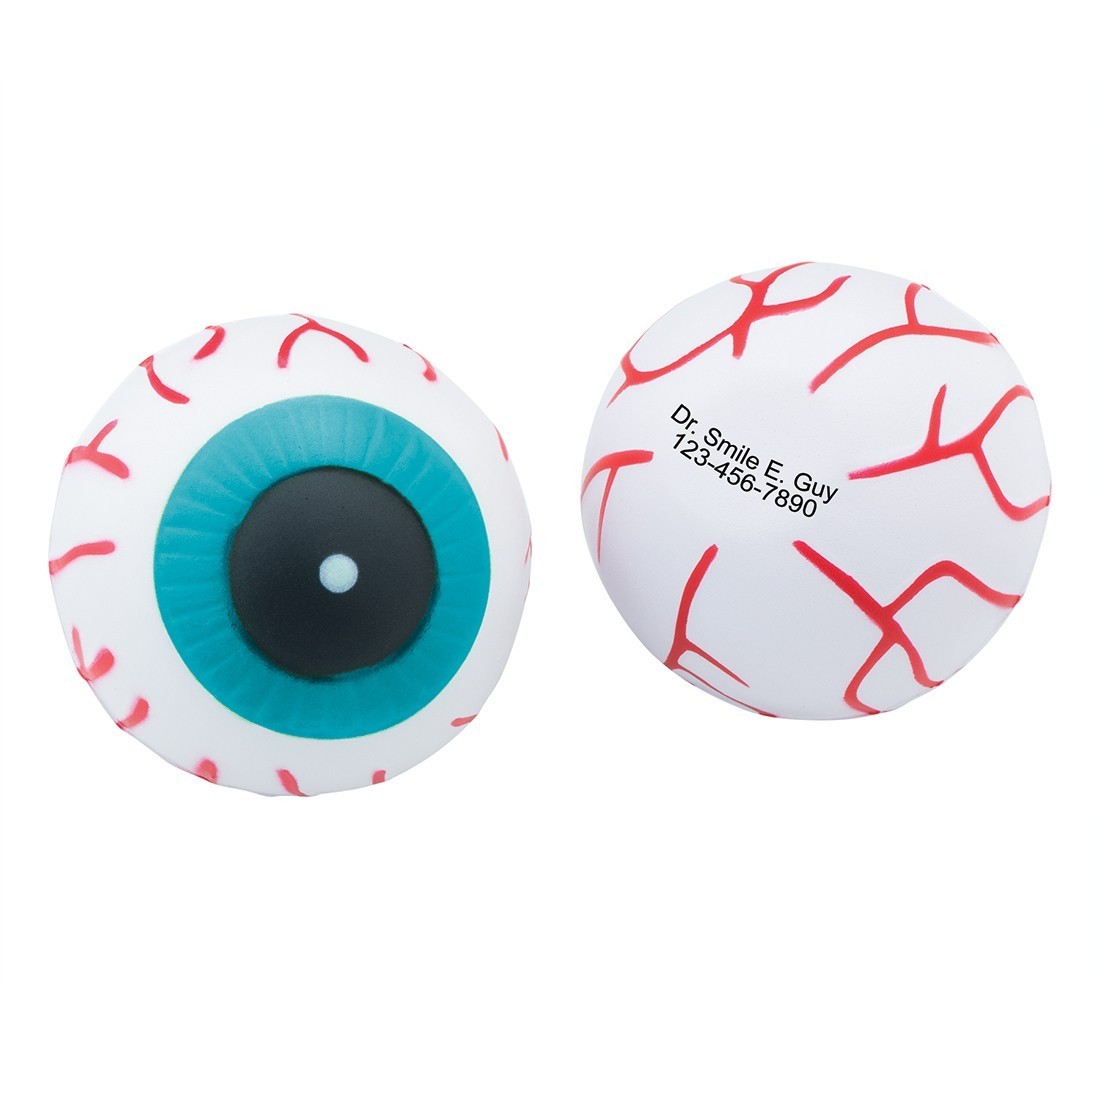 Custom Eyeball Stress Balls [image]